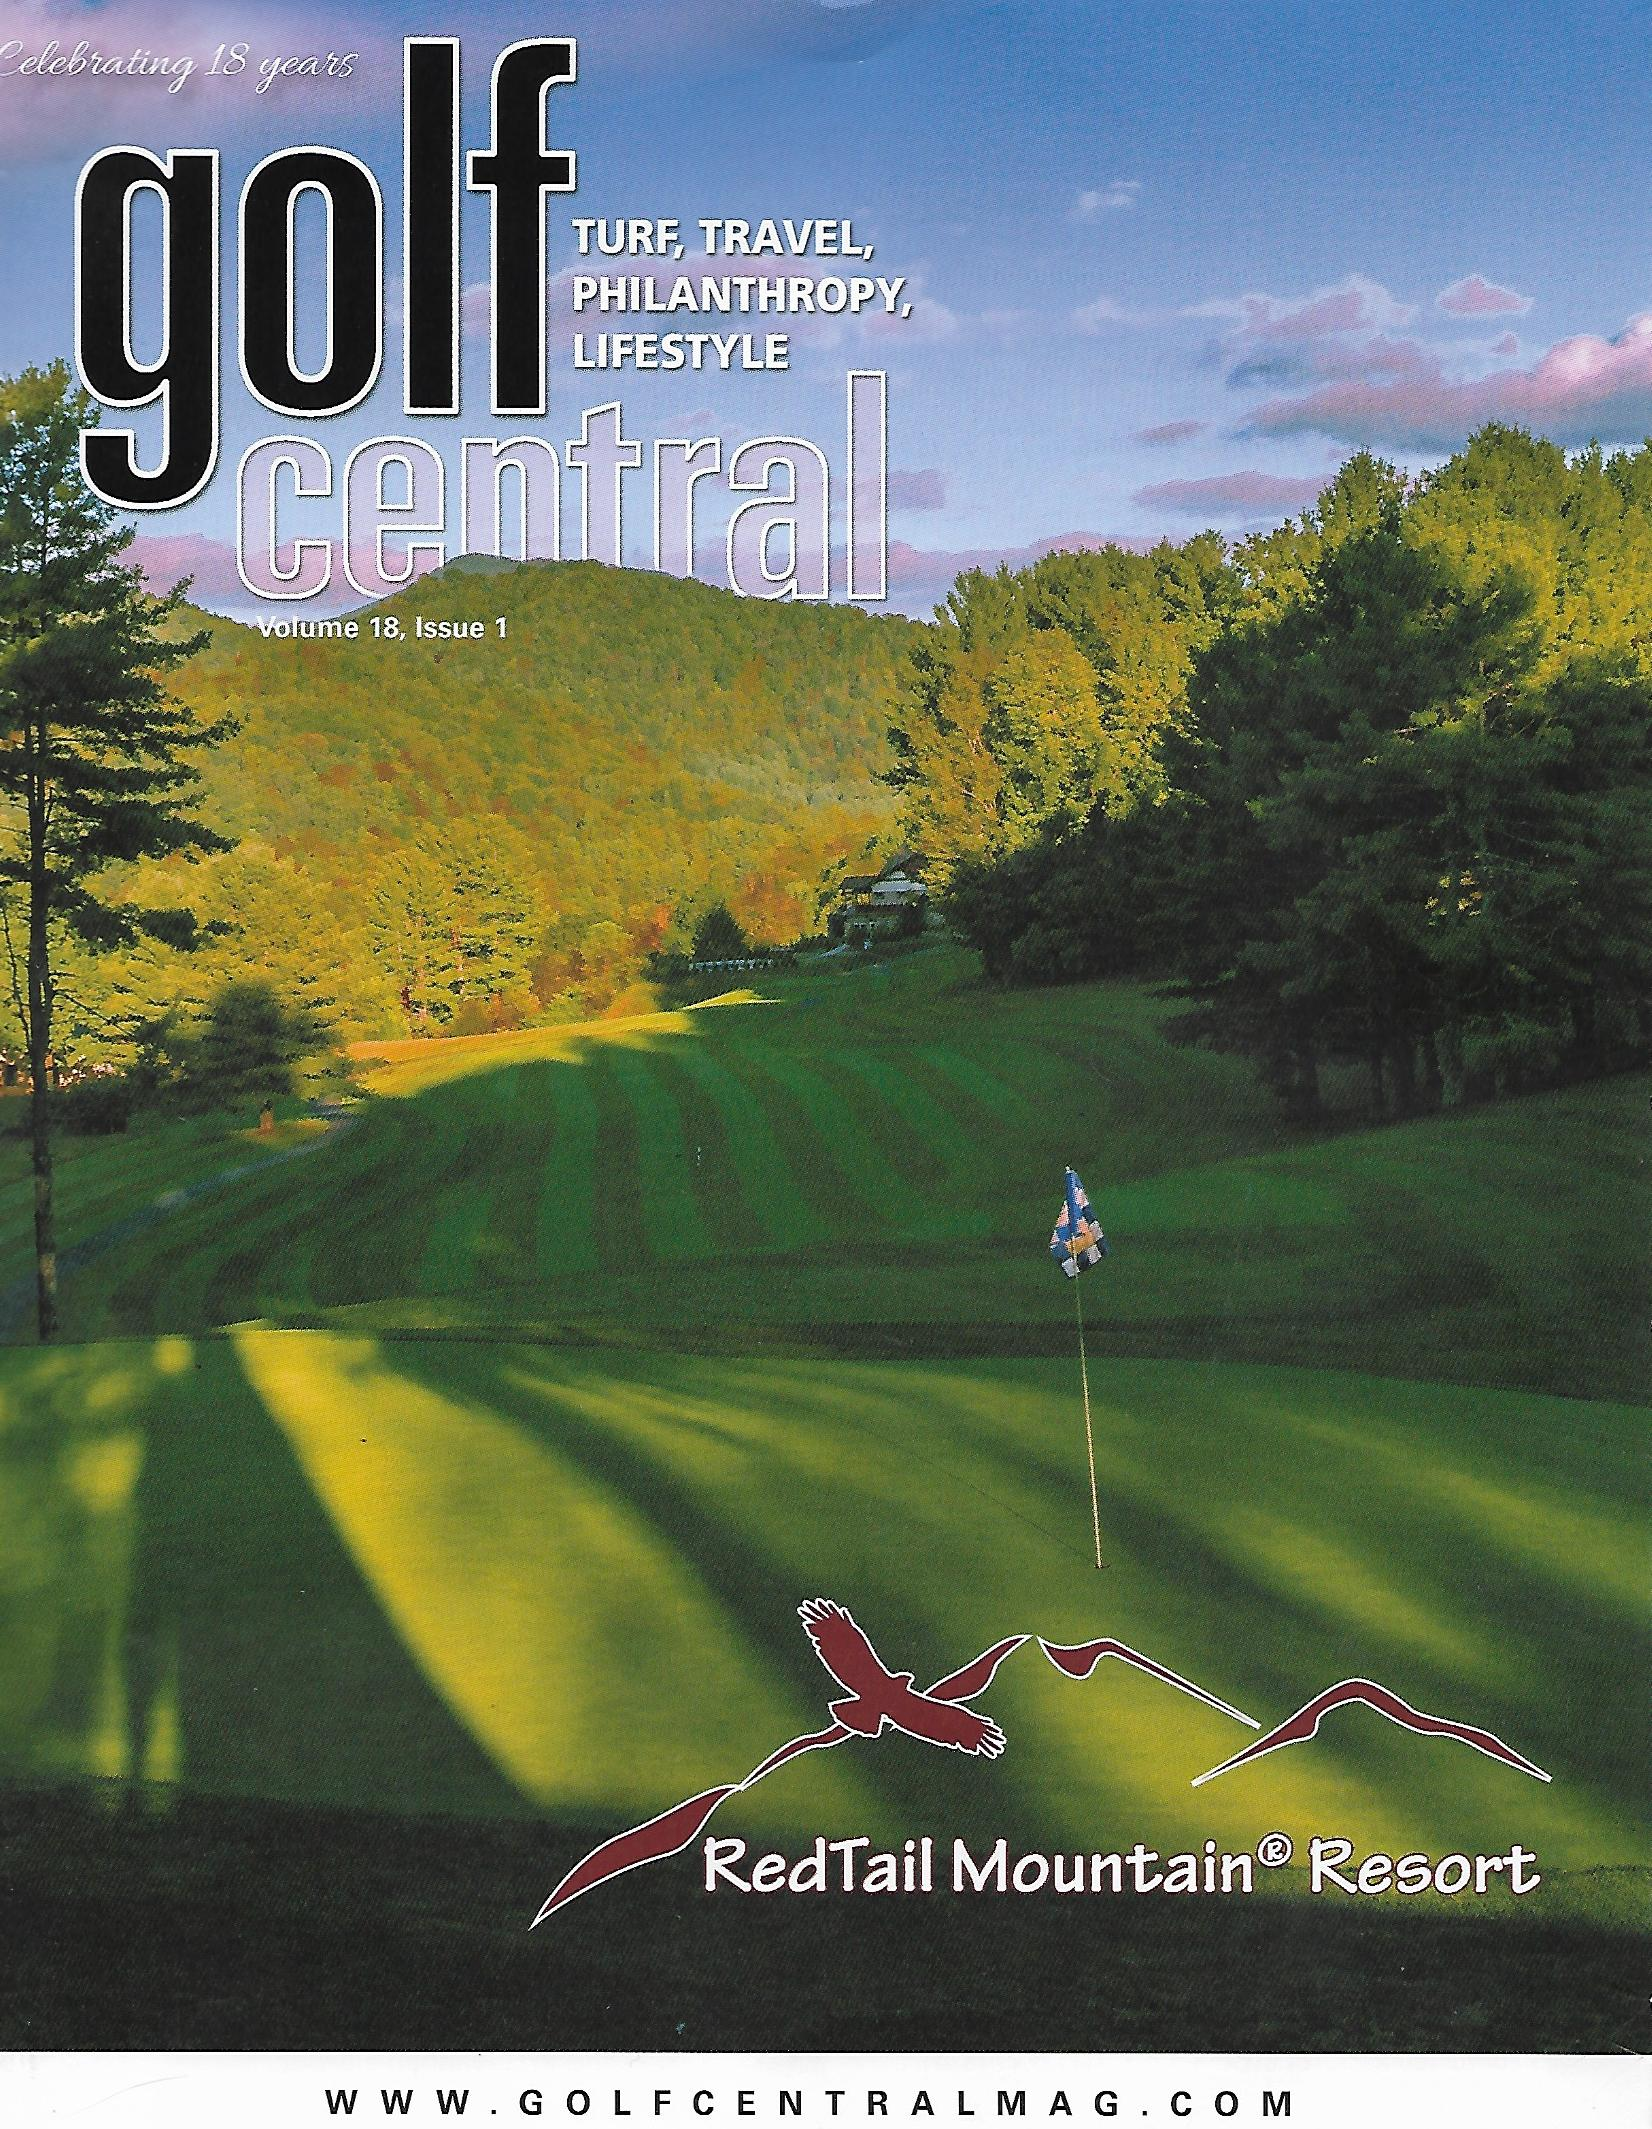 golf-central.jpg